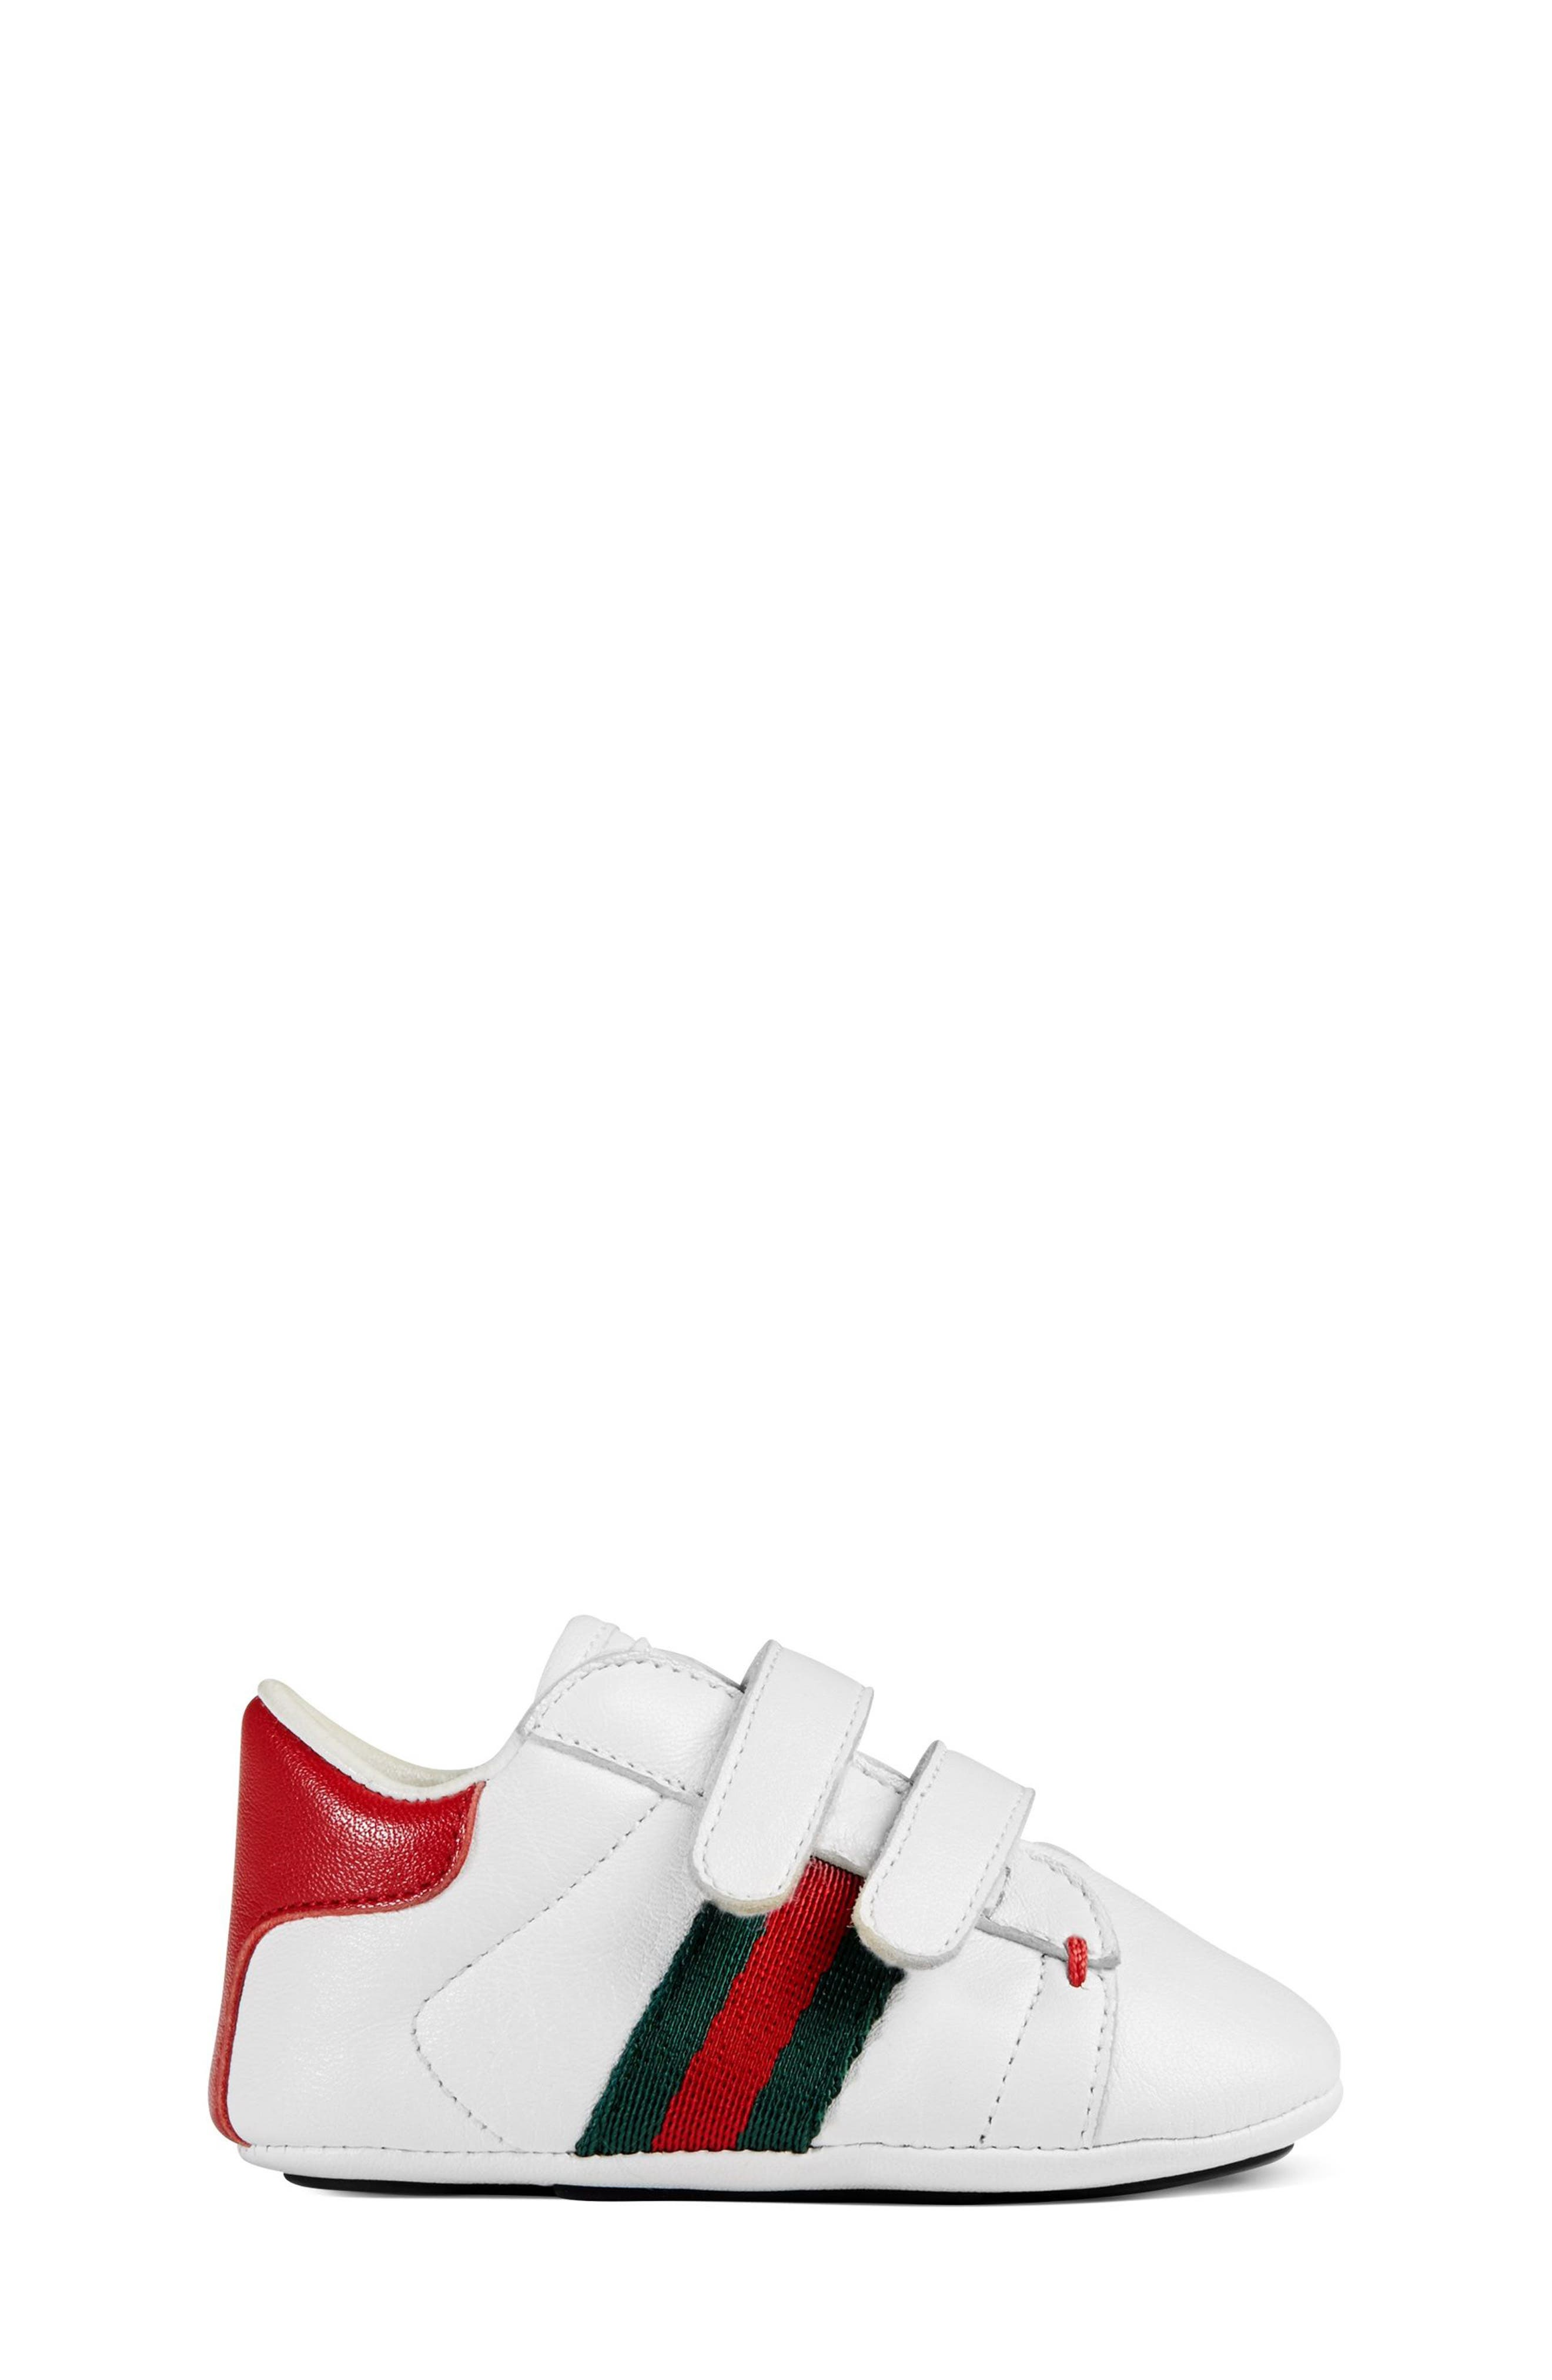 'Ace' Crib Shoe,                             Alternate thumbnail 2, color,                             100